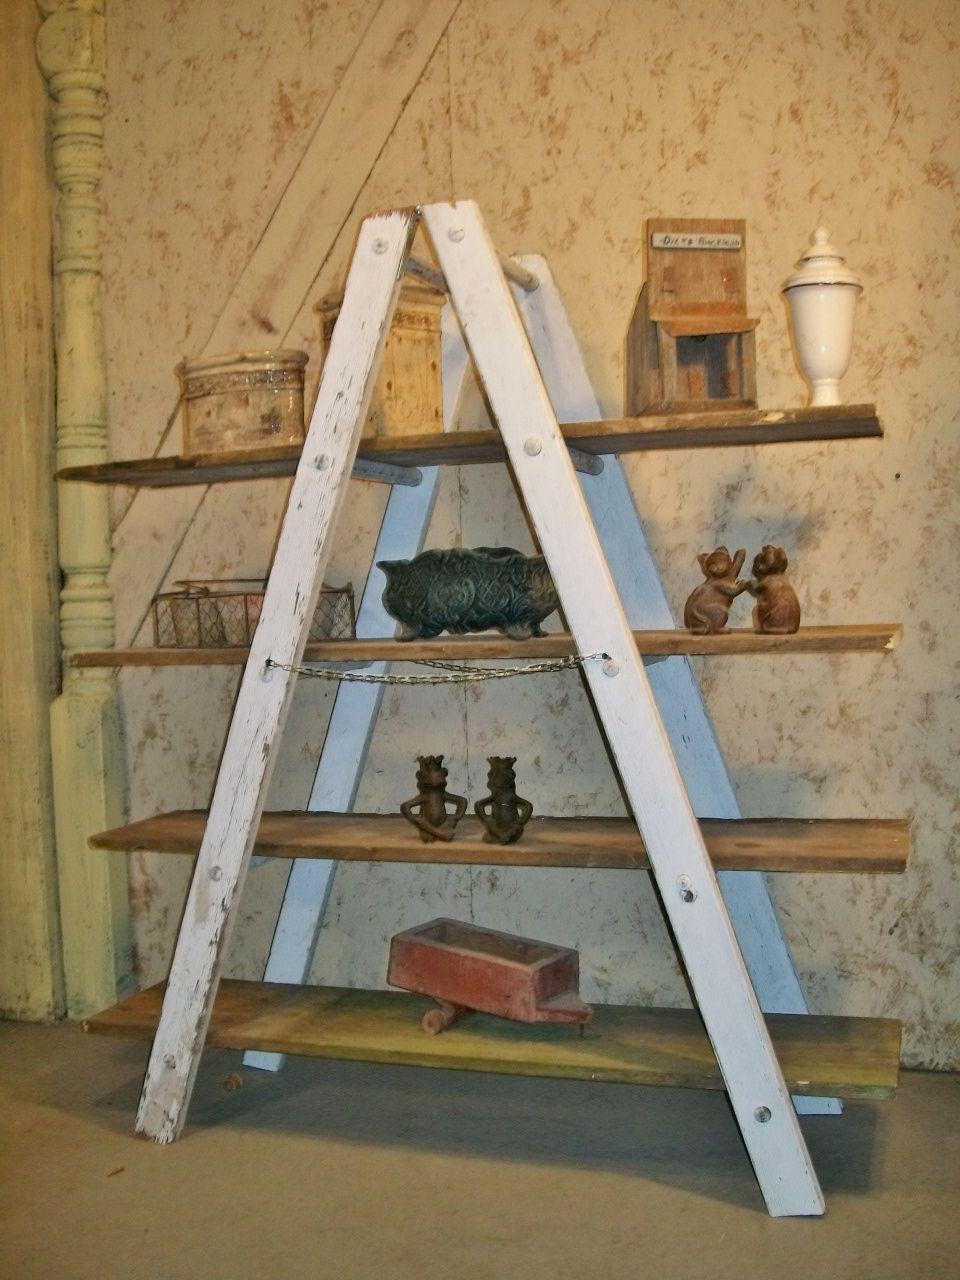 A shaped wooden ladder rustic shelving 5 rung - Reclaimed wood ladder shelf ...